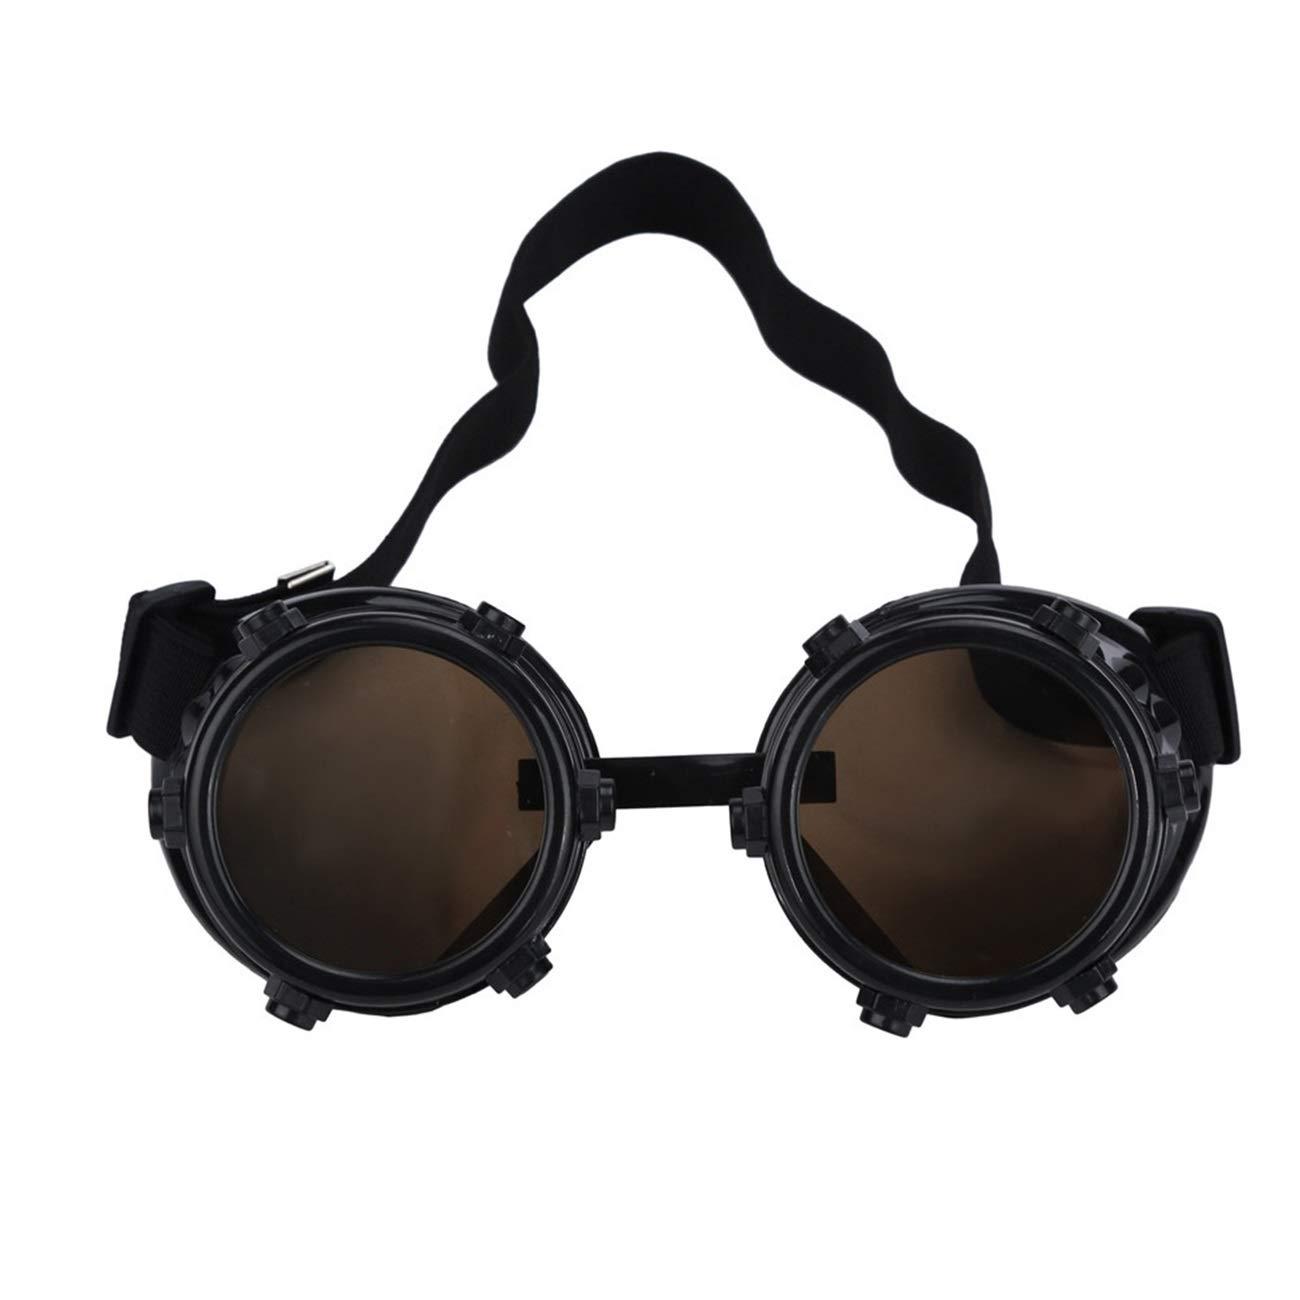 Amazon.com: Bnialaed Unisex Vintage Round Sun Glasses Retro ...